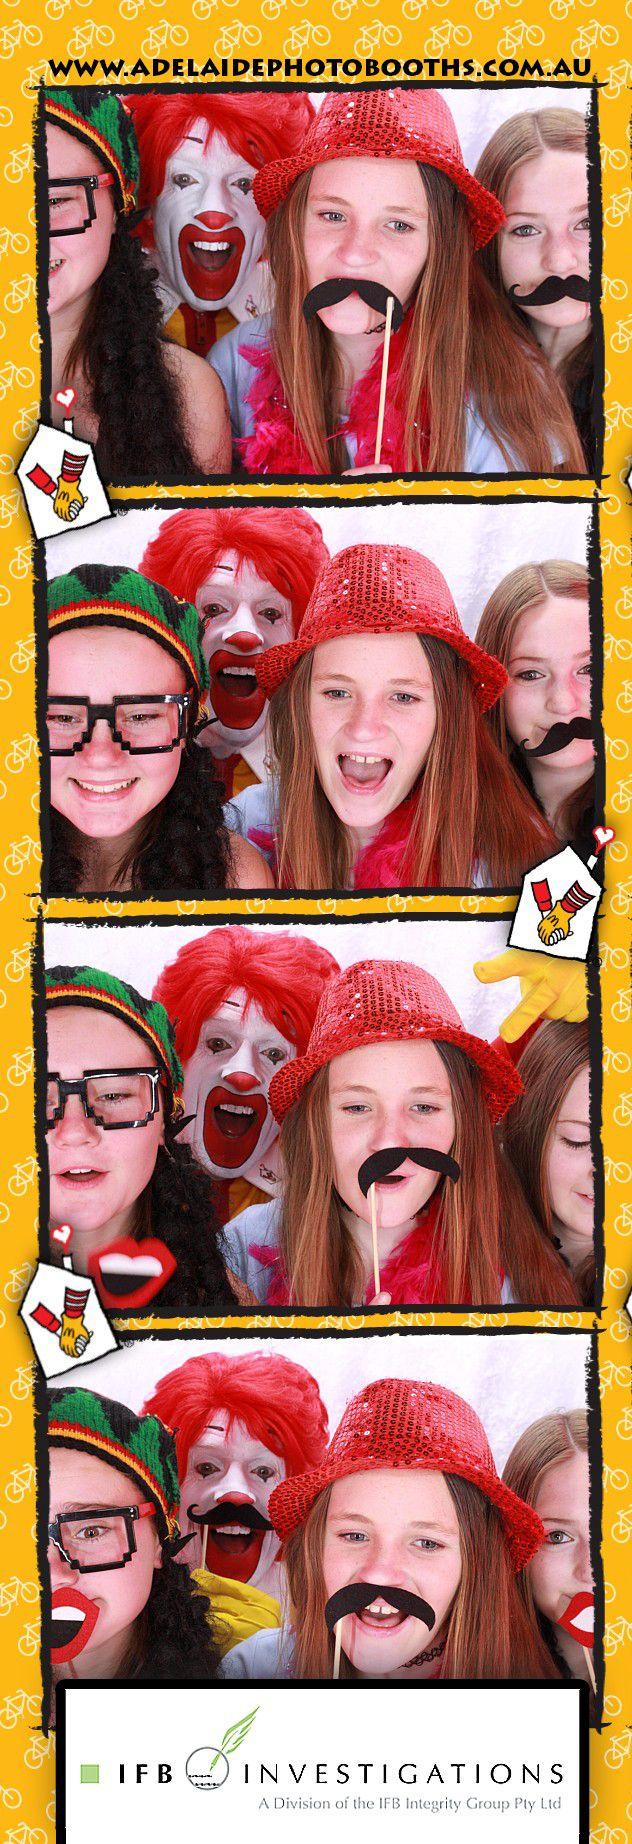 "Ronal Mcdonald House Charities ""ride for sick kids"" mildura #adelaide #photobooths #ronald #charitys #rmhc #fundraising"